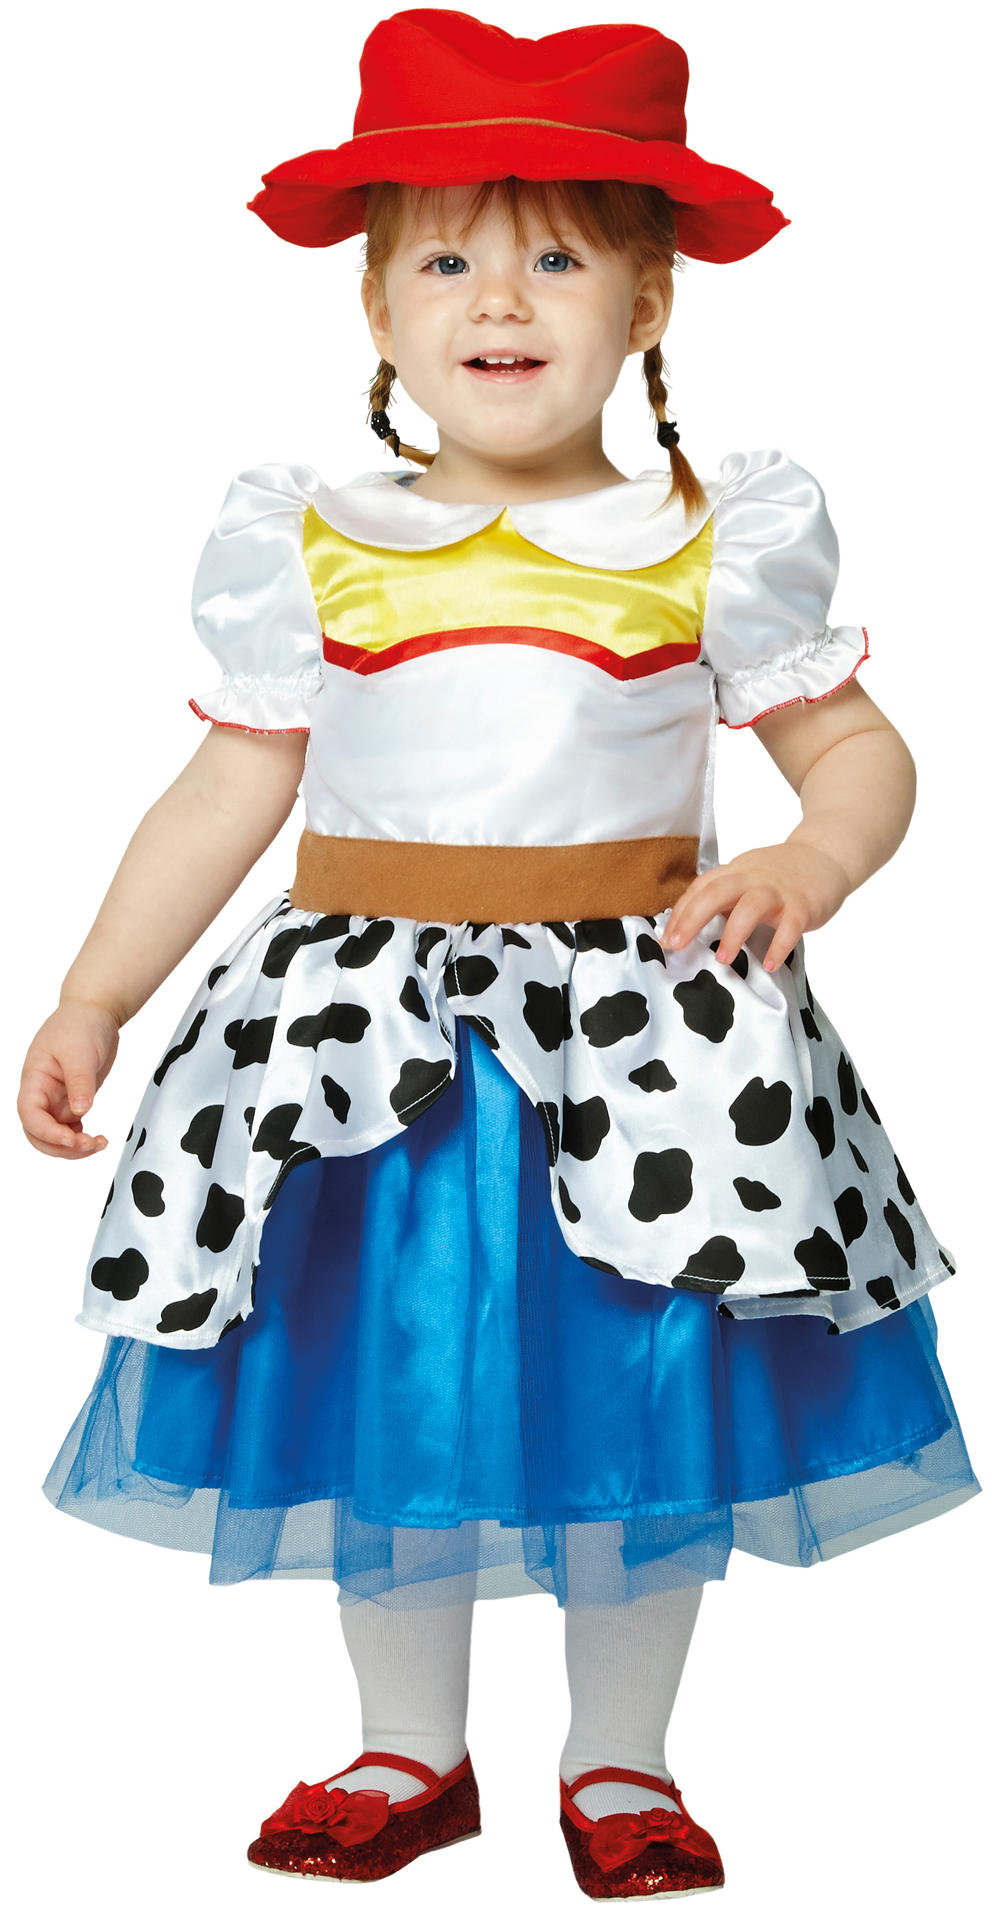 Jessie Toy Story Girls Fancy Dress Cowgirl Kids Disney Toddlers Infants Costume